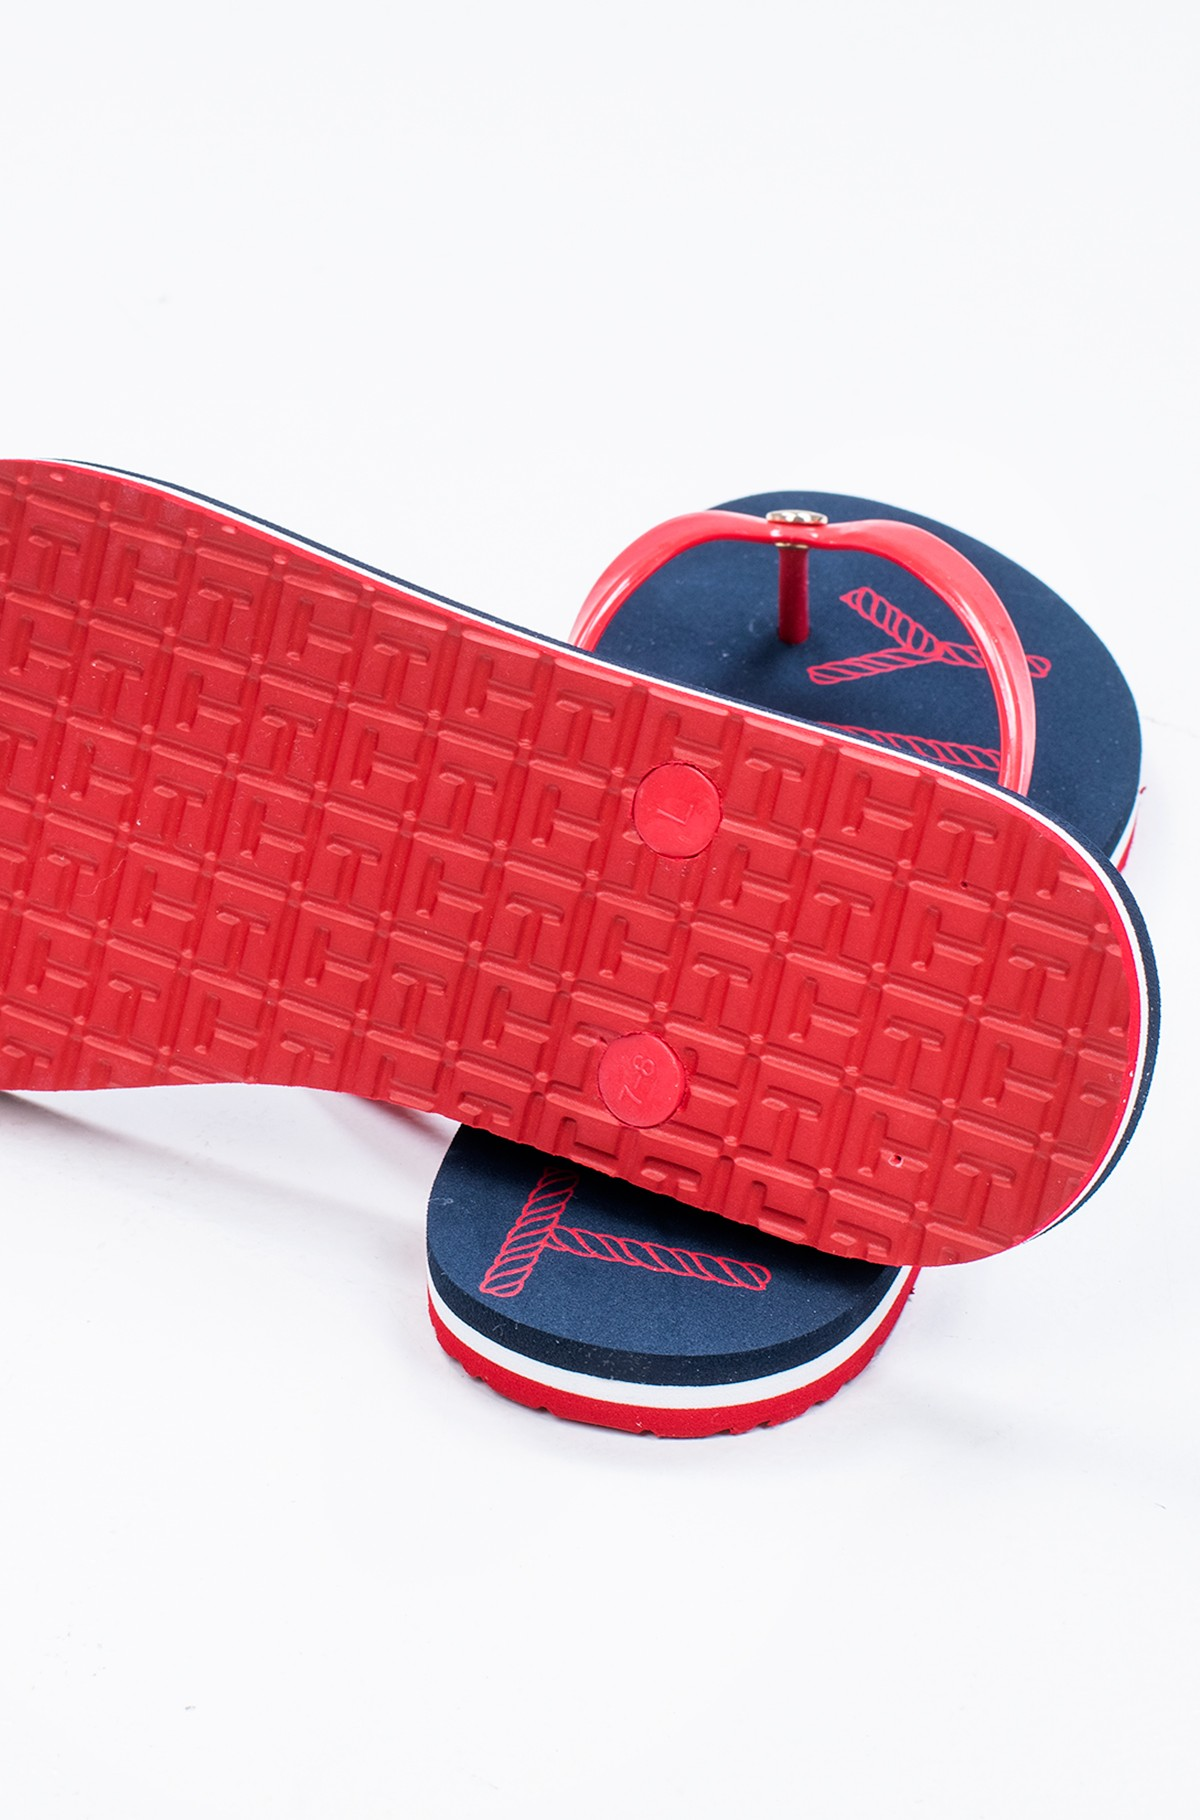 Flip-flops TOMMY FOOTBED FLAT BEACH SANDAL-full-2